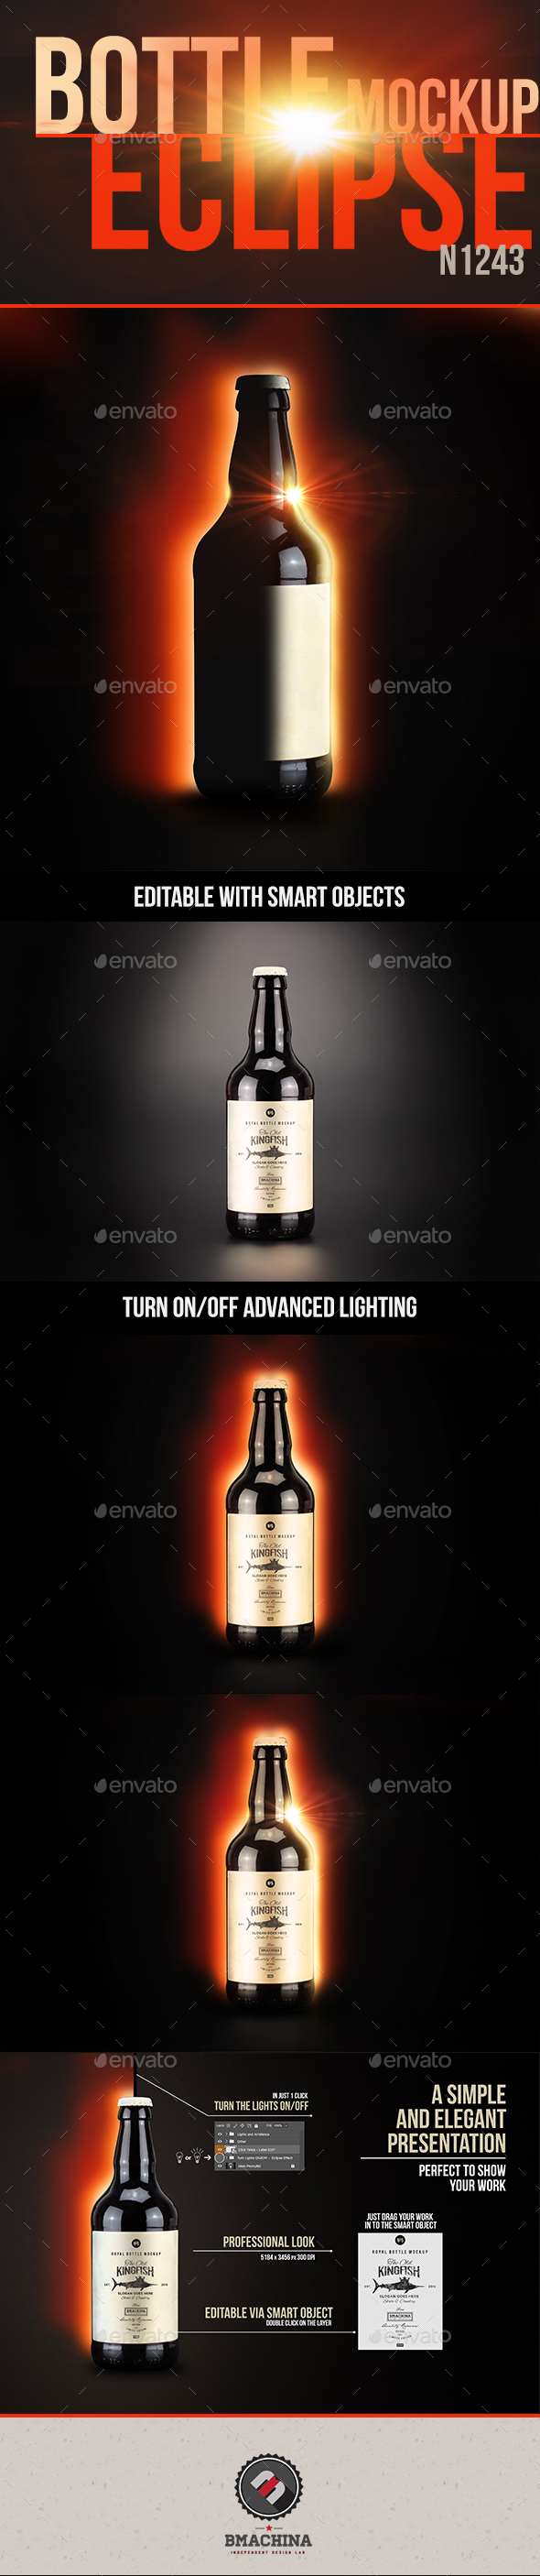 Eclipse Mockup - Bottle N1943 - Product Mock-Ups Graphics